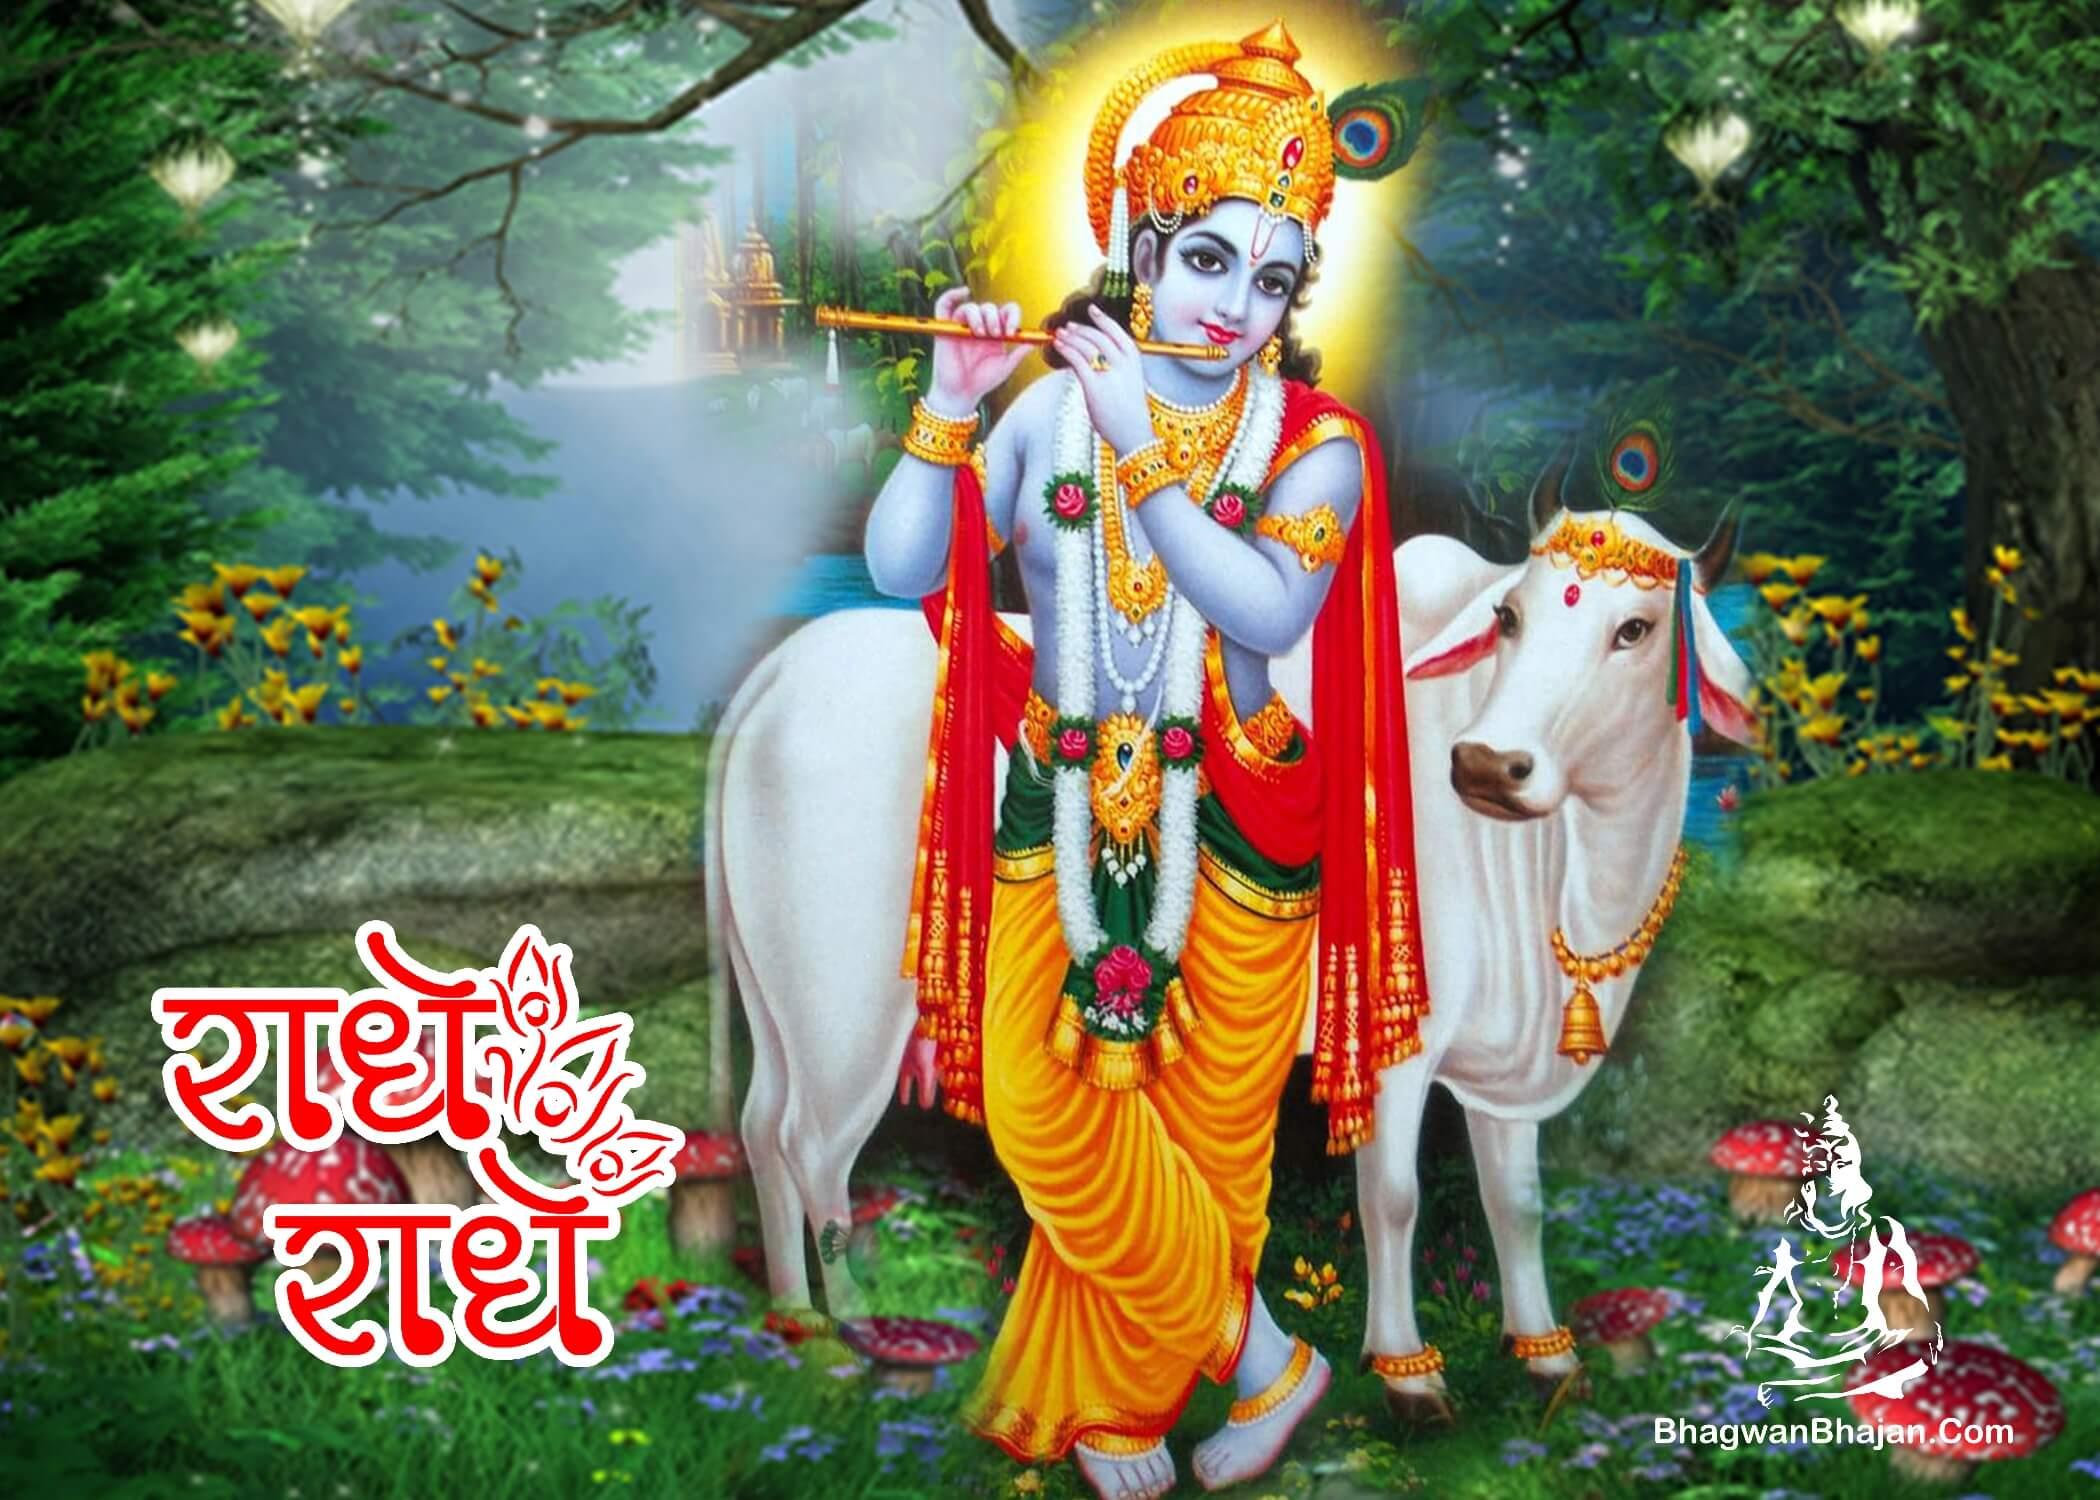 radhe krishna radhe radhe hd wallpaper